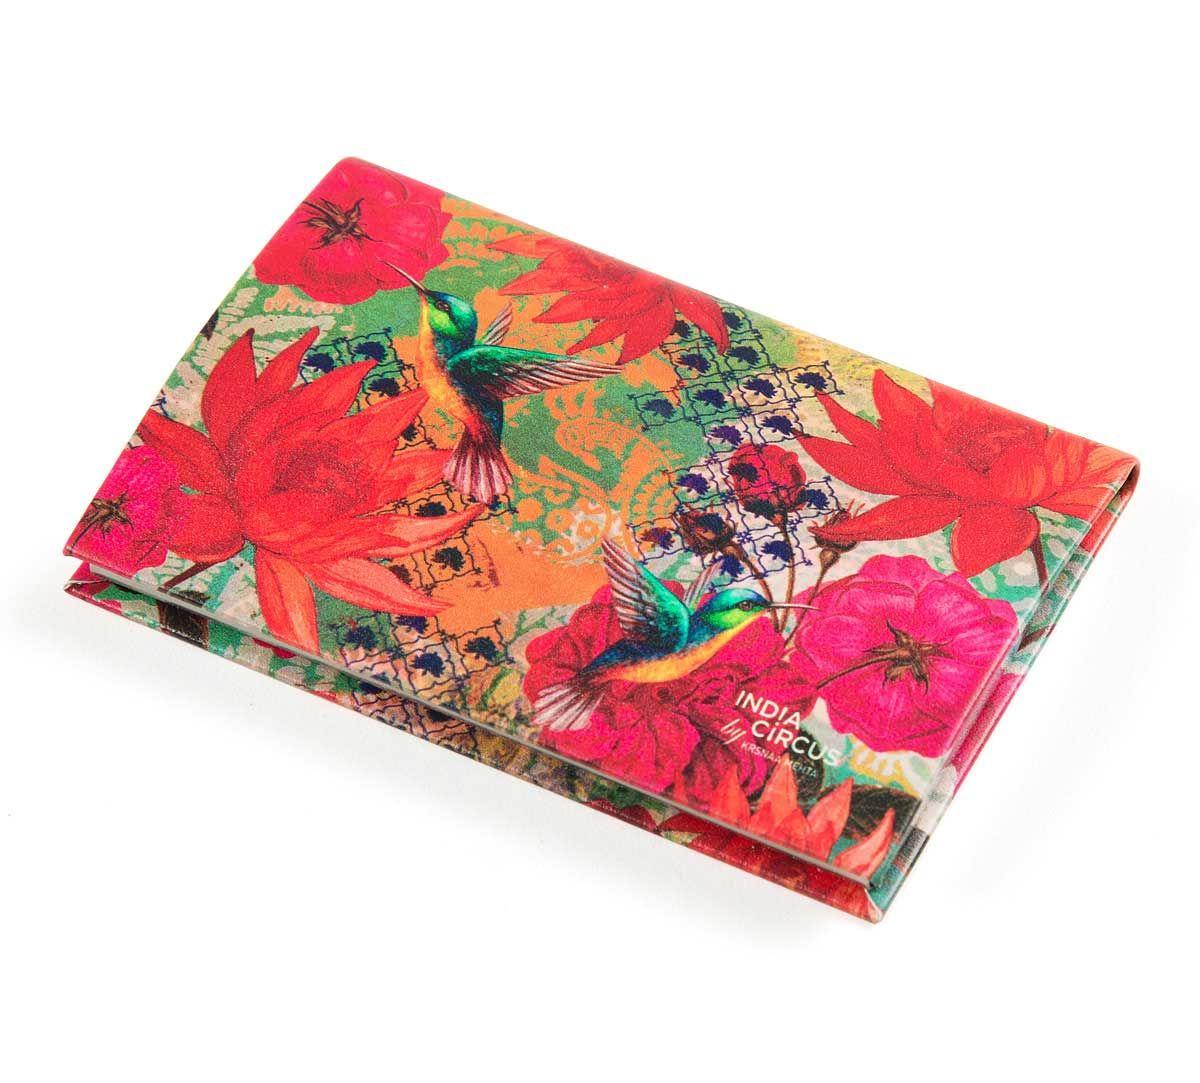 India Circus Floral Kingdom Visiting Card Holder